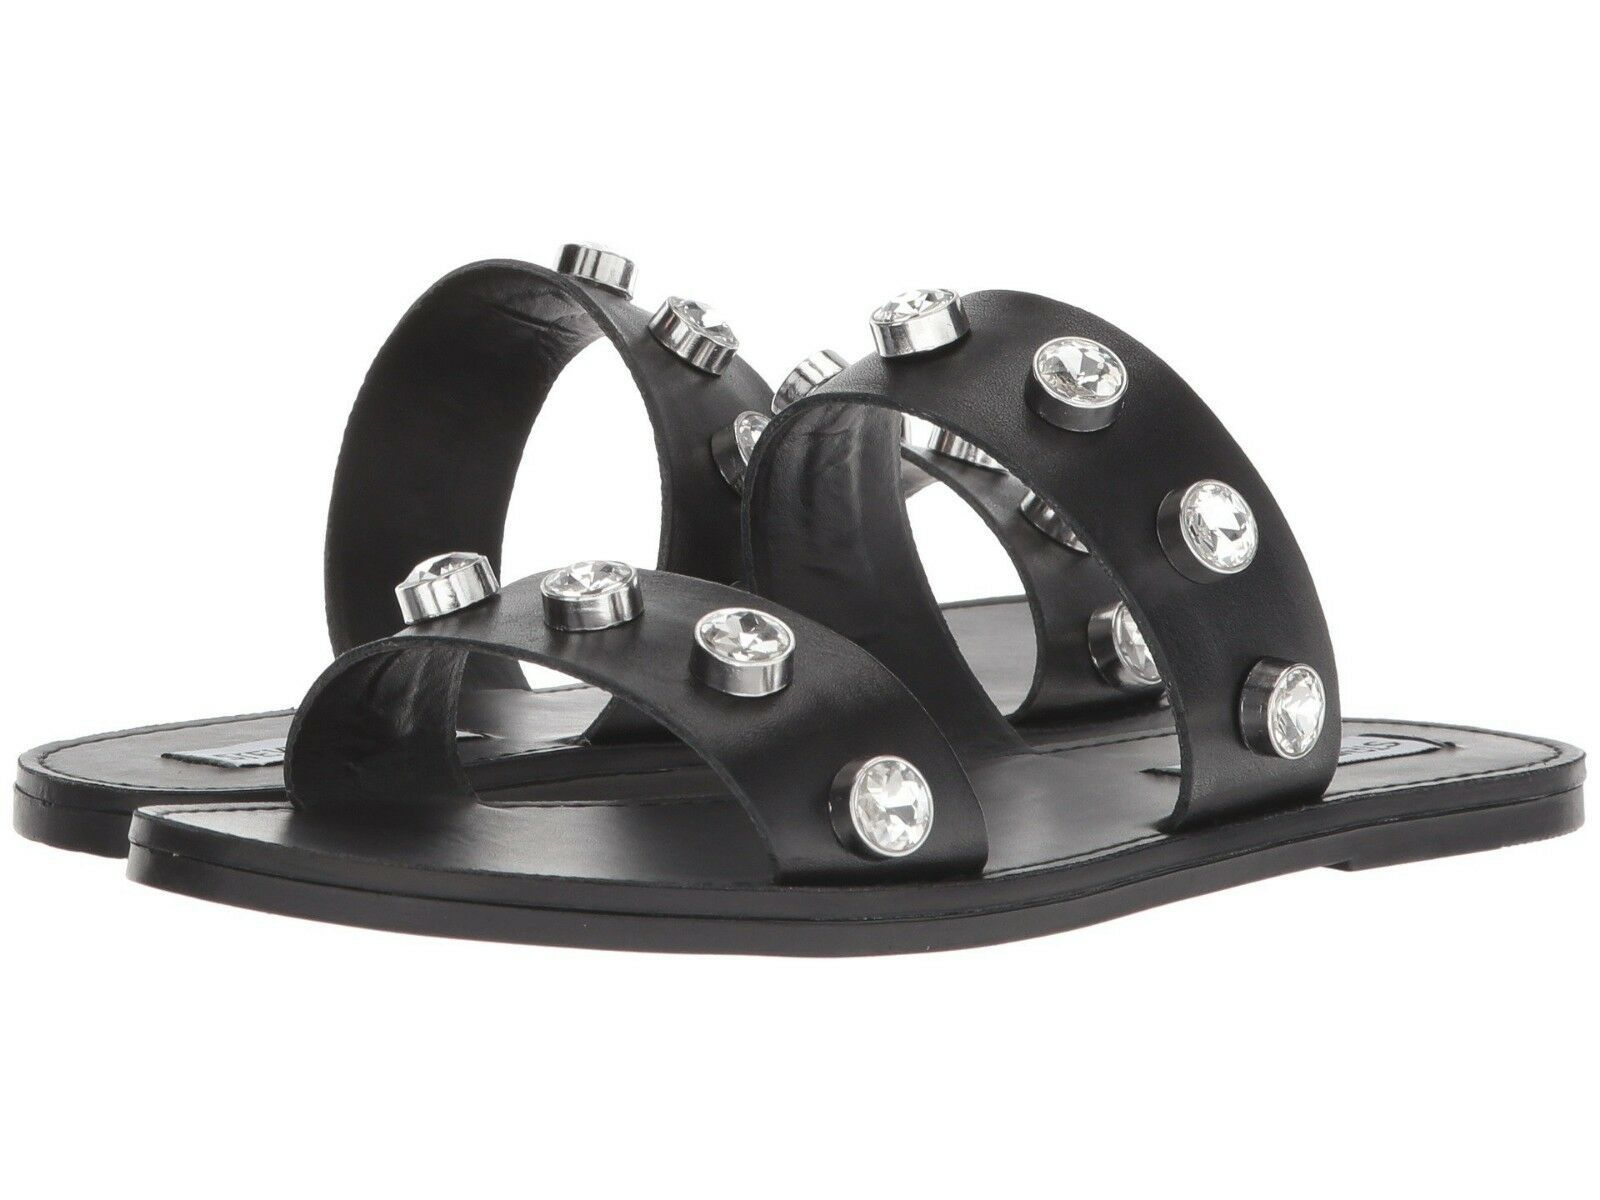 Steve Madden JESSY Slide Flats Sandals Black Women Size 7.5